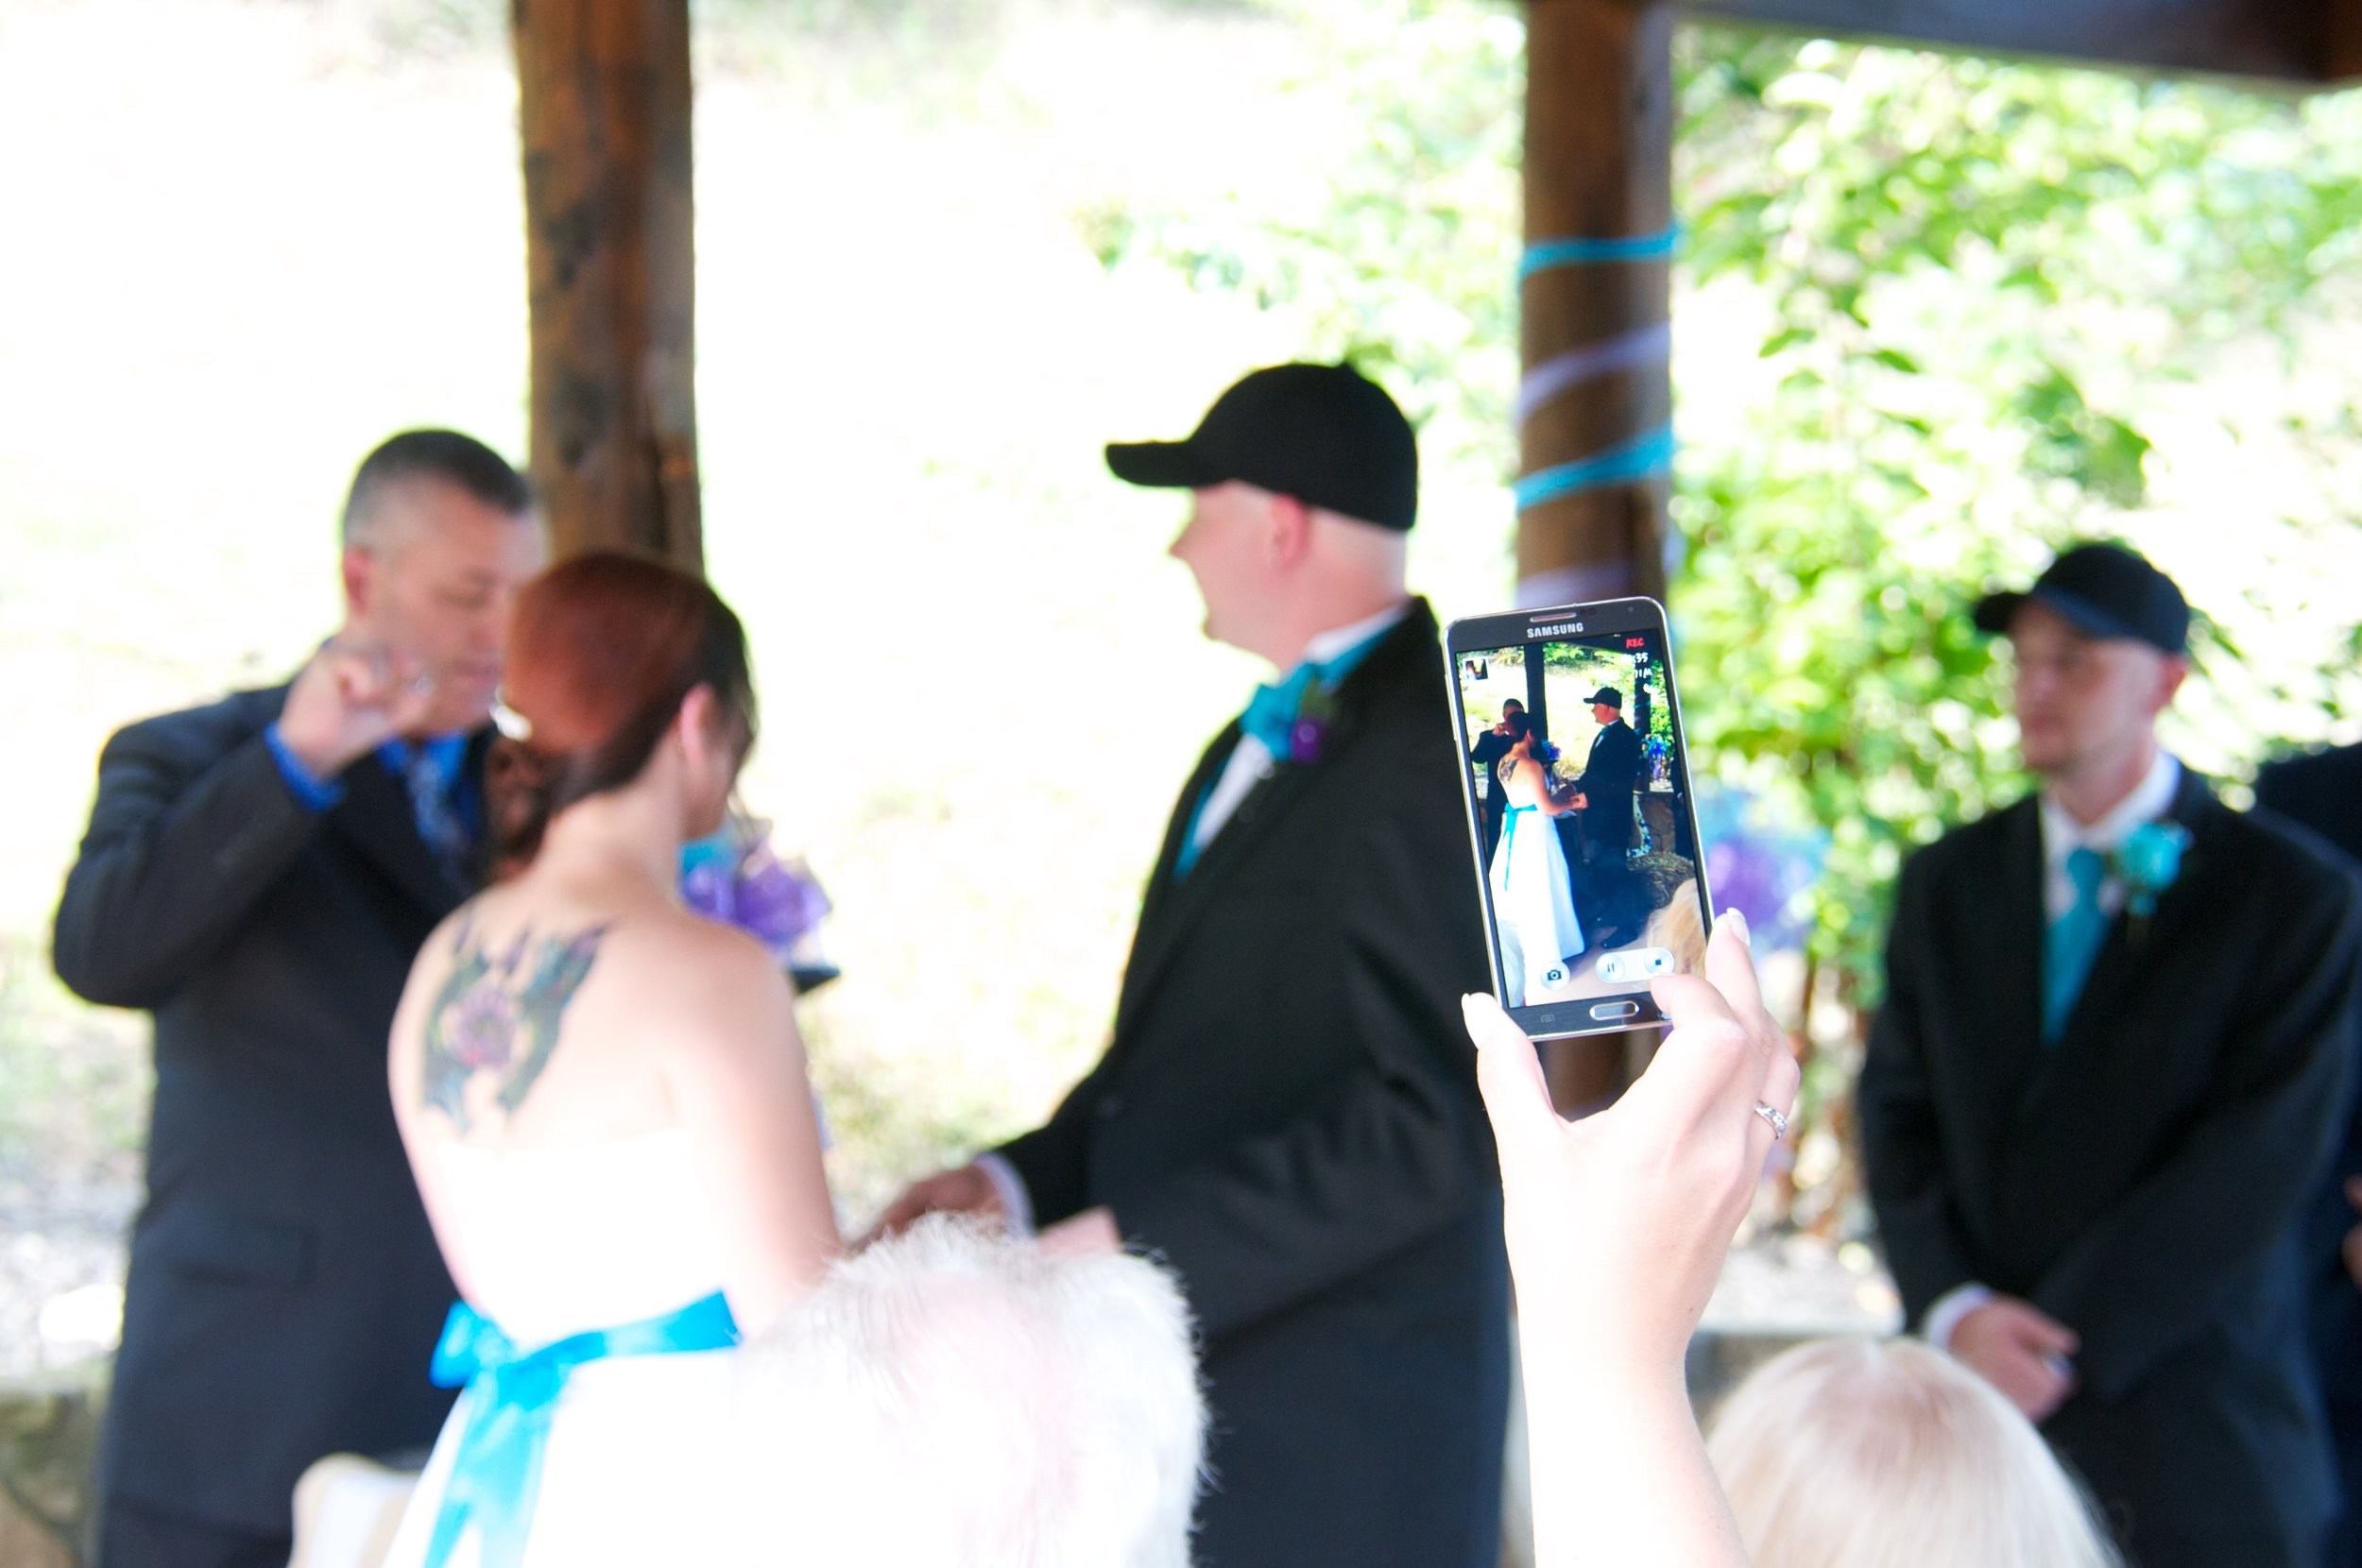 Smart phone ruins a wedding photo